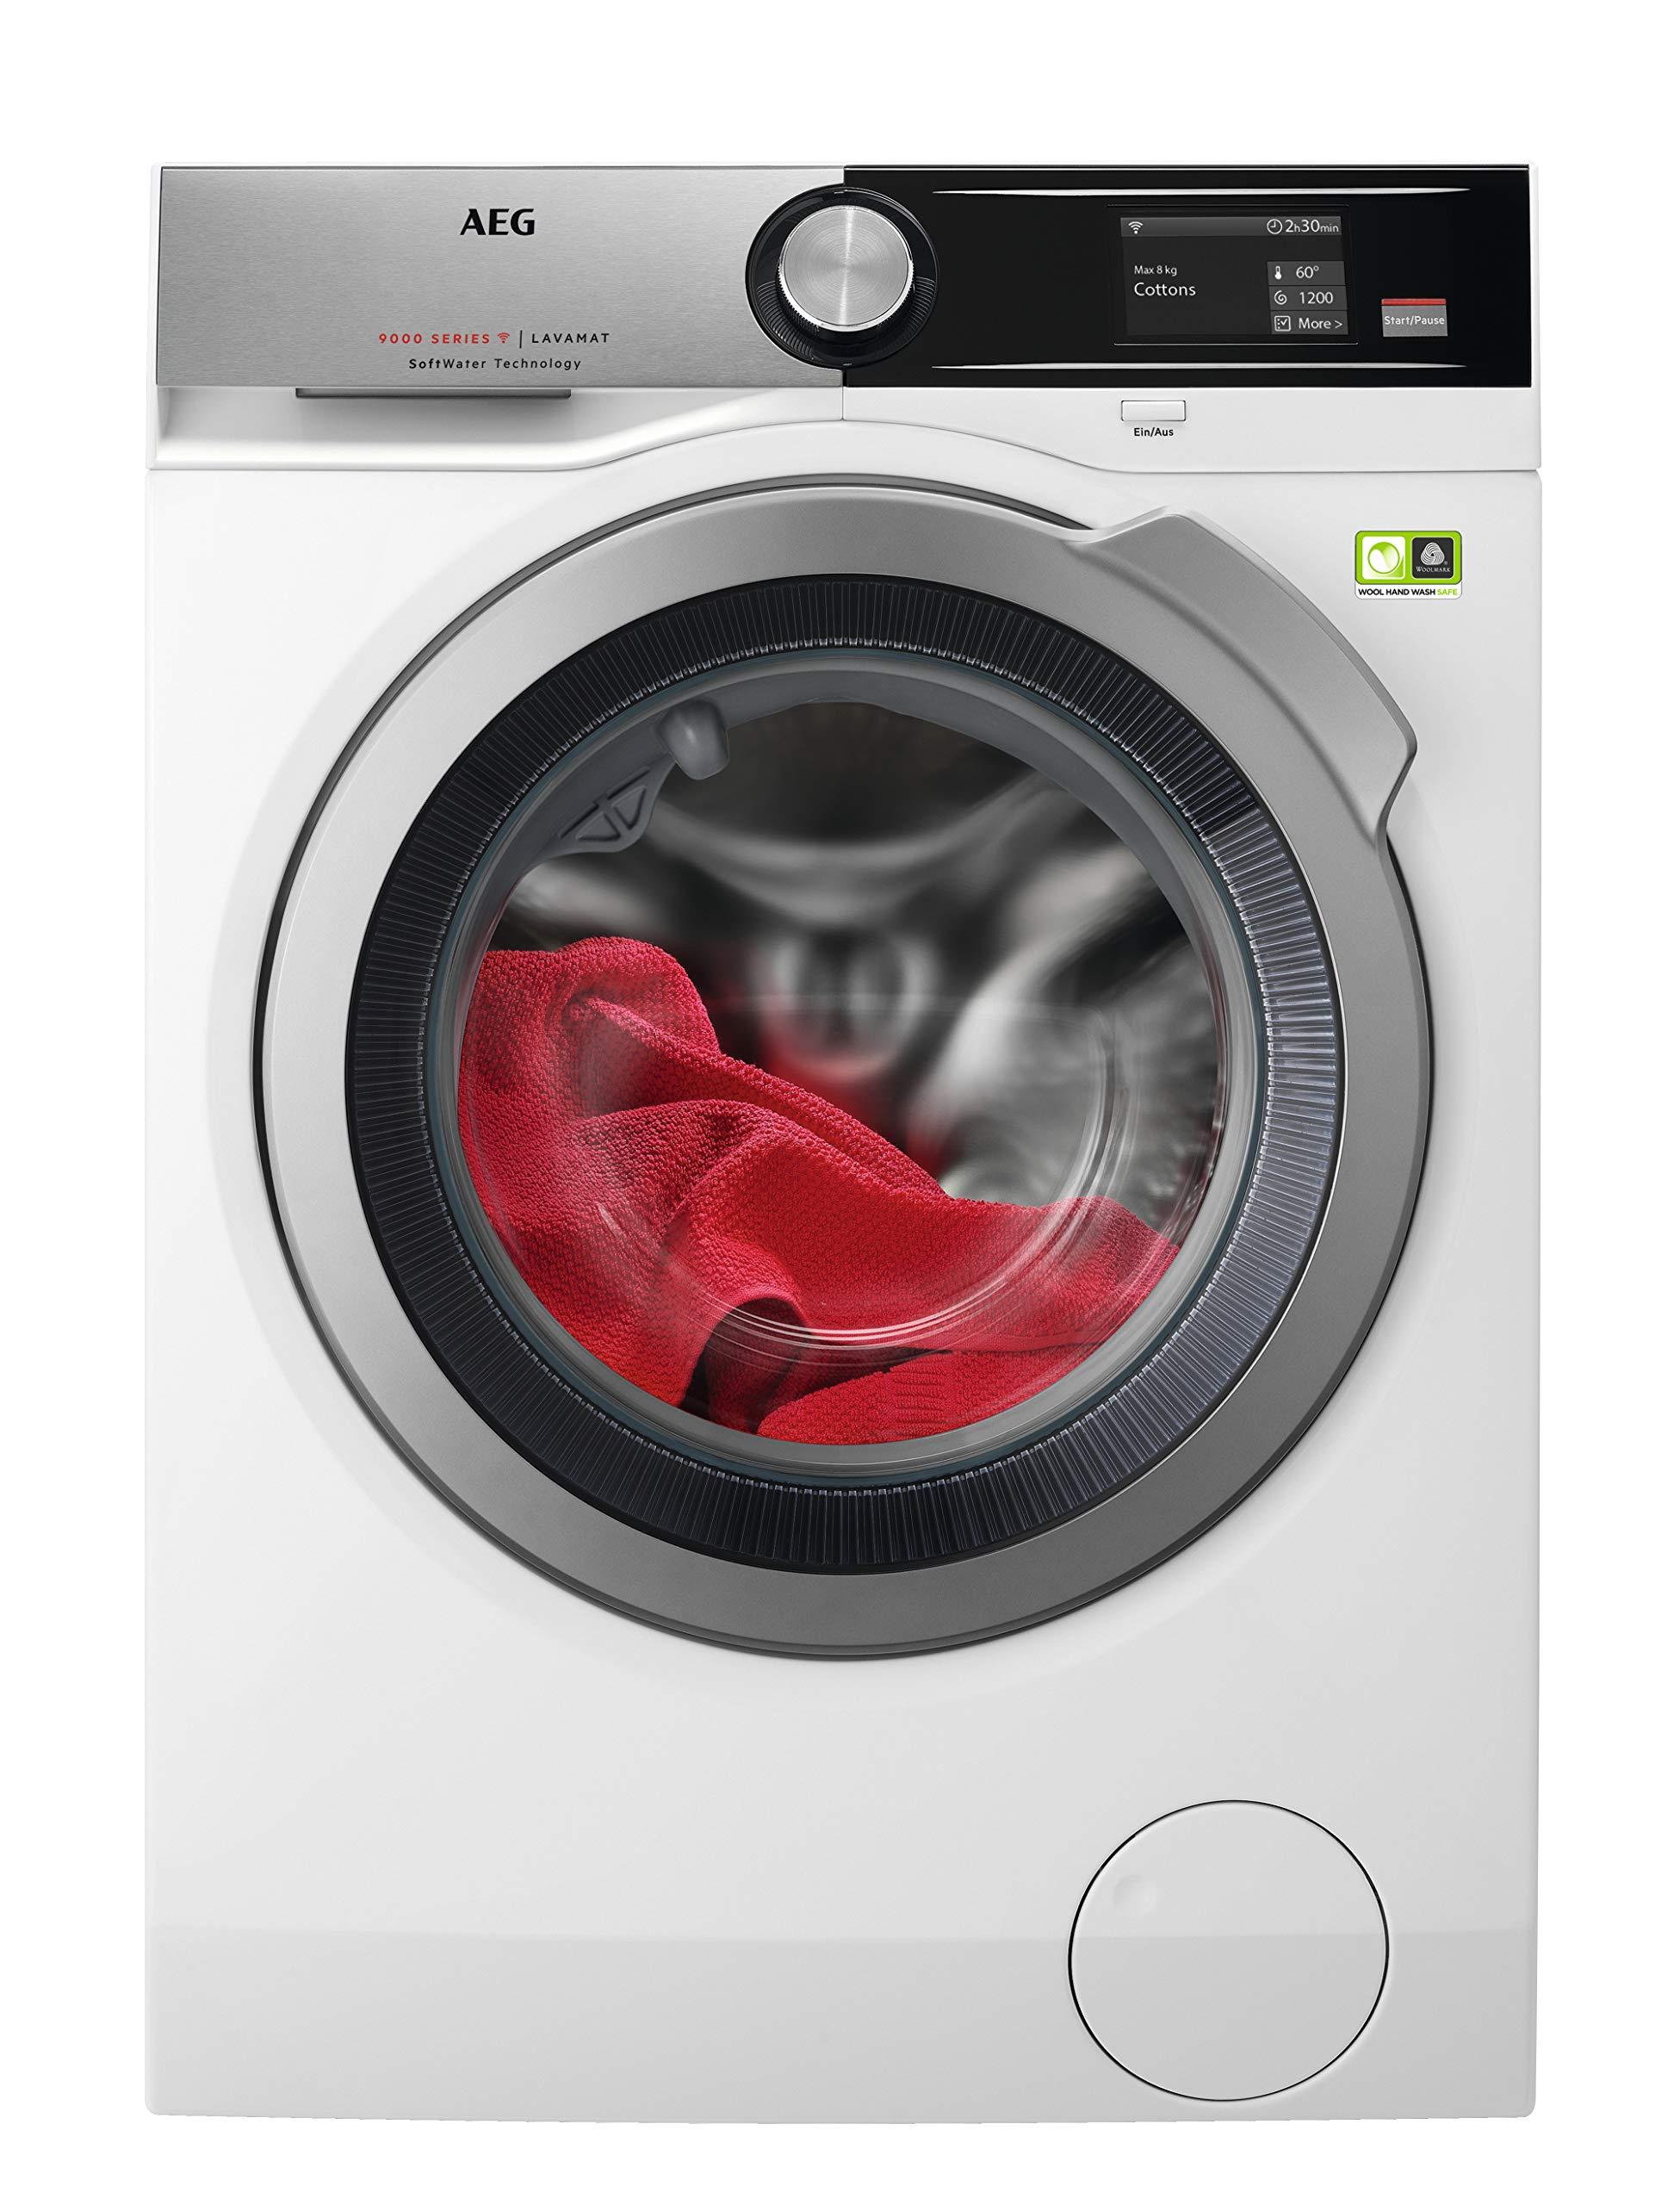 AEG L9FE96695 Waschmaschine Frontlader, 9 kg, ProTex Schontrommel, Knitterschutz